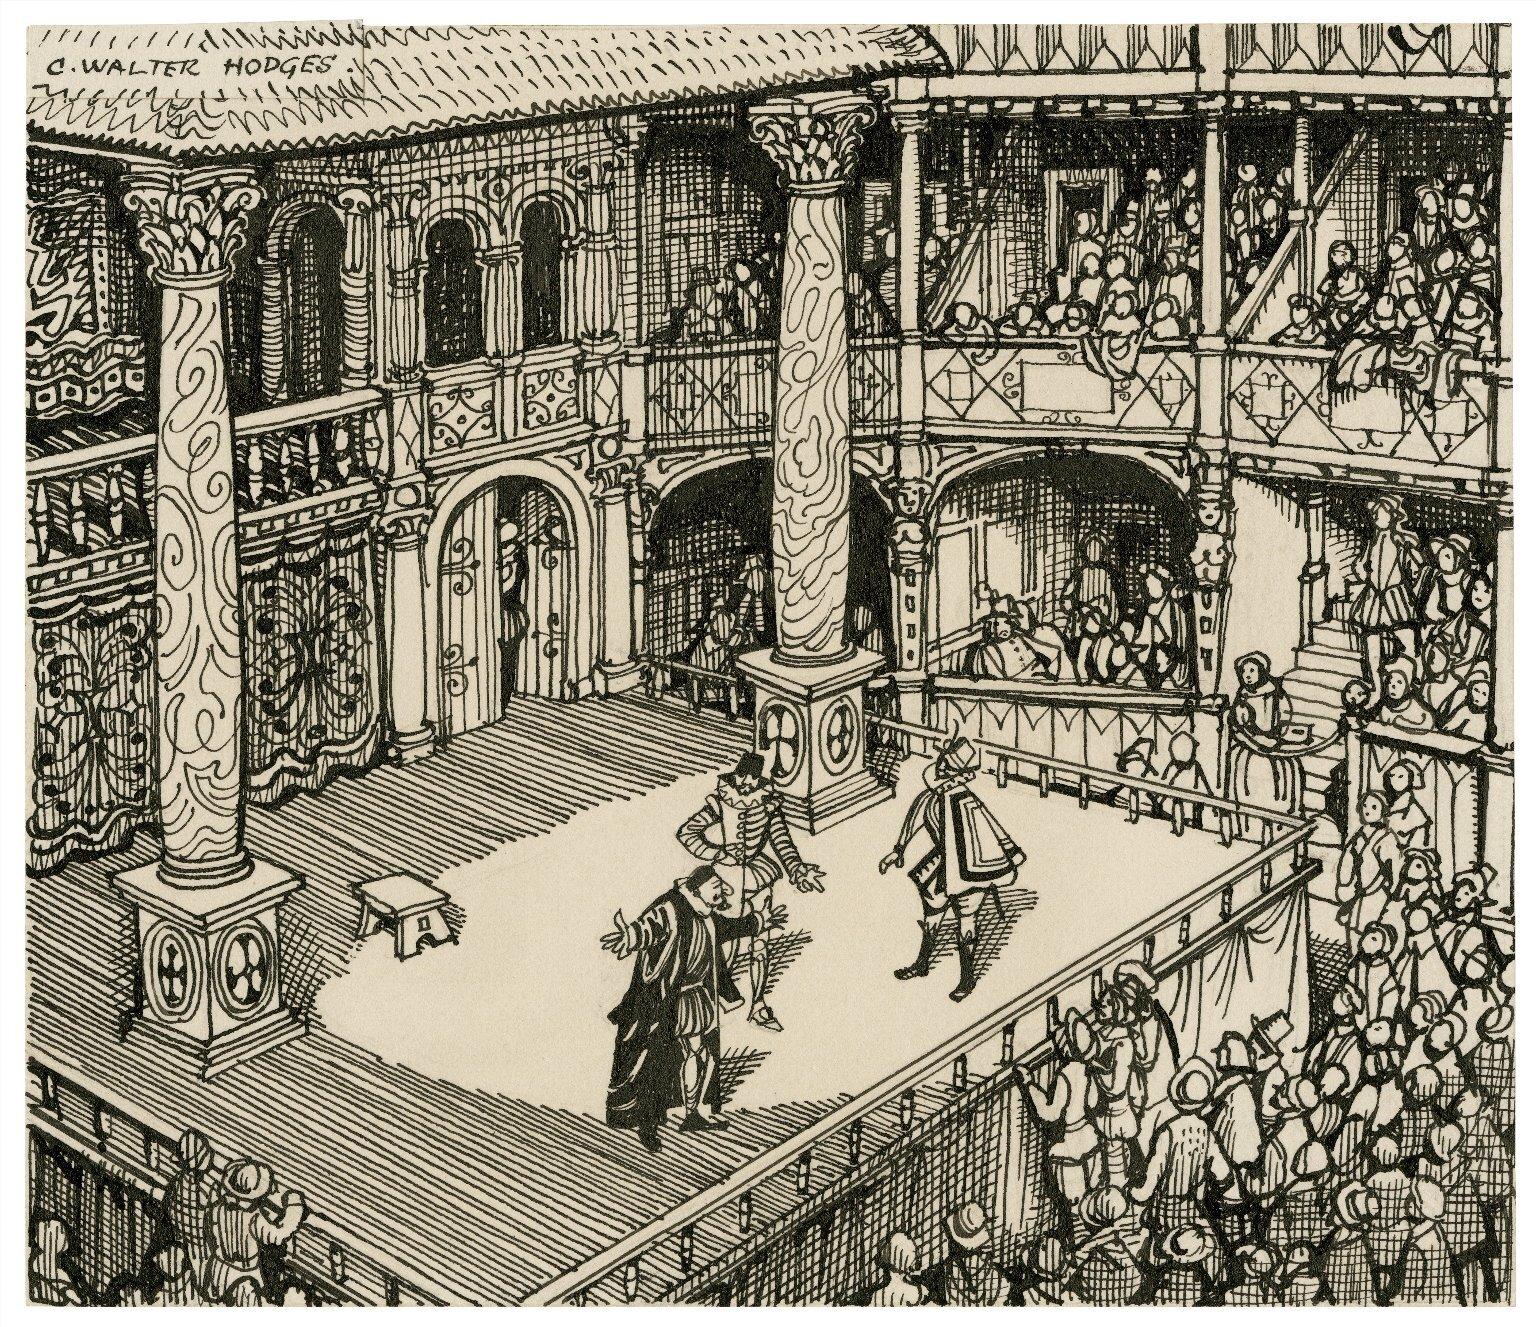 Scena Teatru Globe Scena Teatru Globe Źródło: C. Walter Hodges, Scena Teatru Globe, ok. 1953, rysunek, licencja: CC BY-SA 4.0.